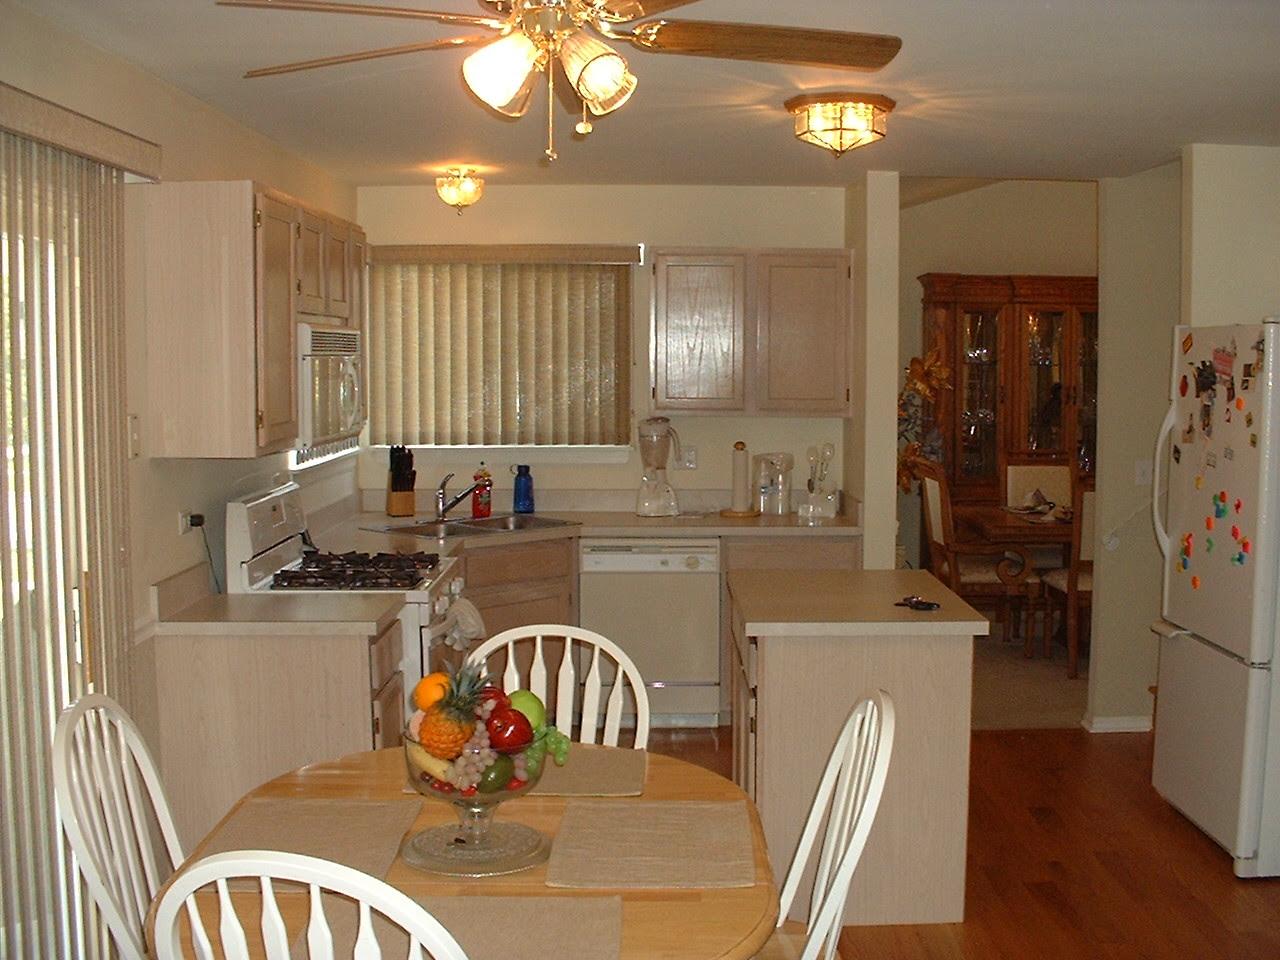 Kitchen Paint Colors with Oak Cabinets